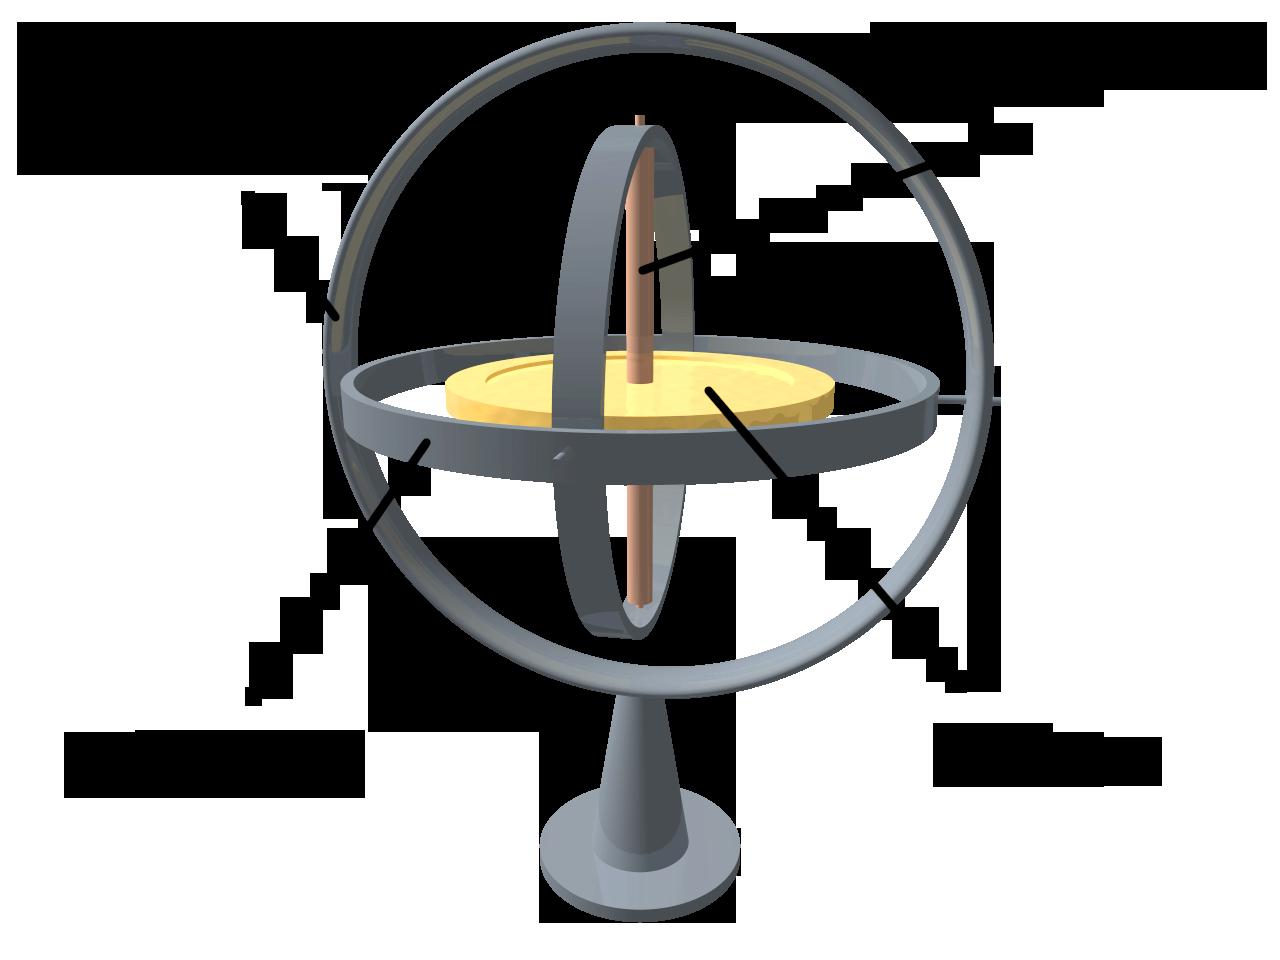 3D_Gyroscope